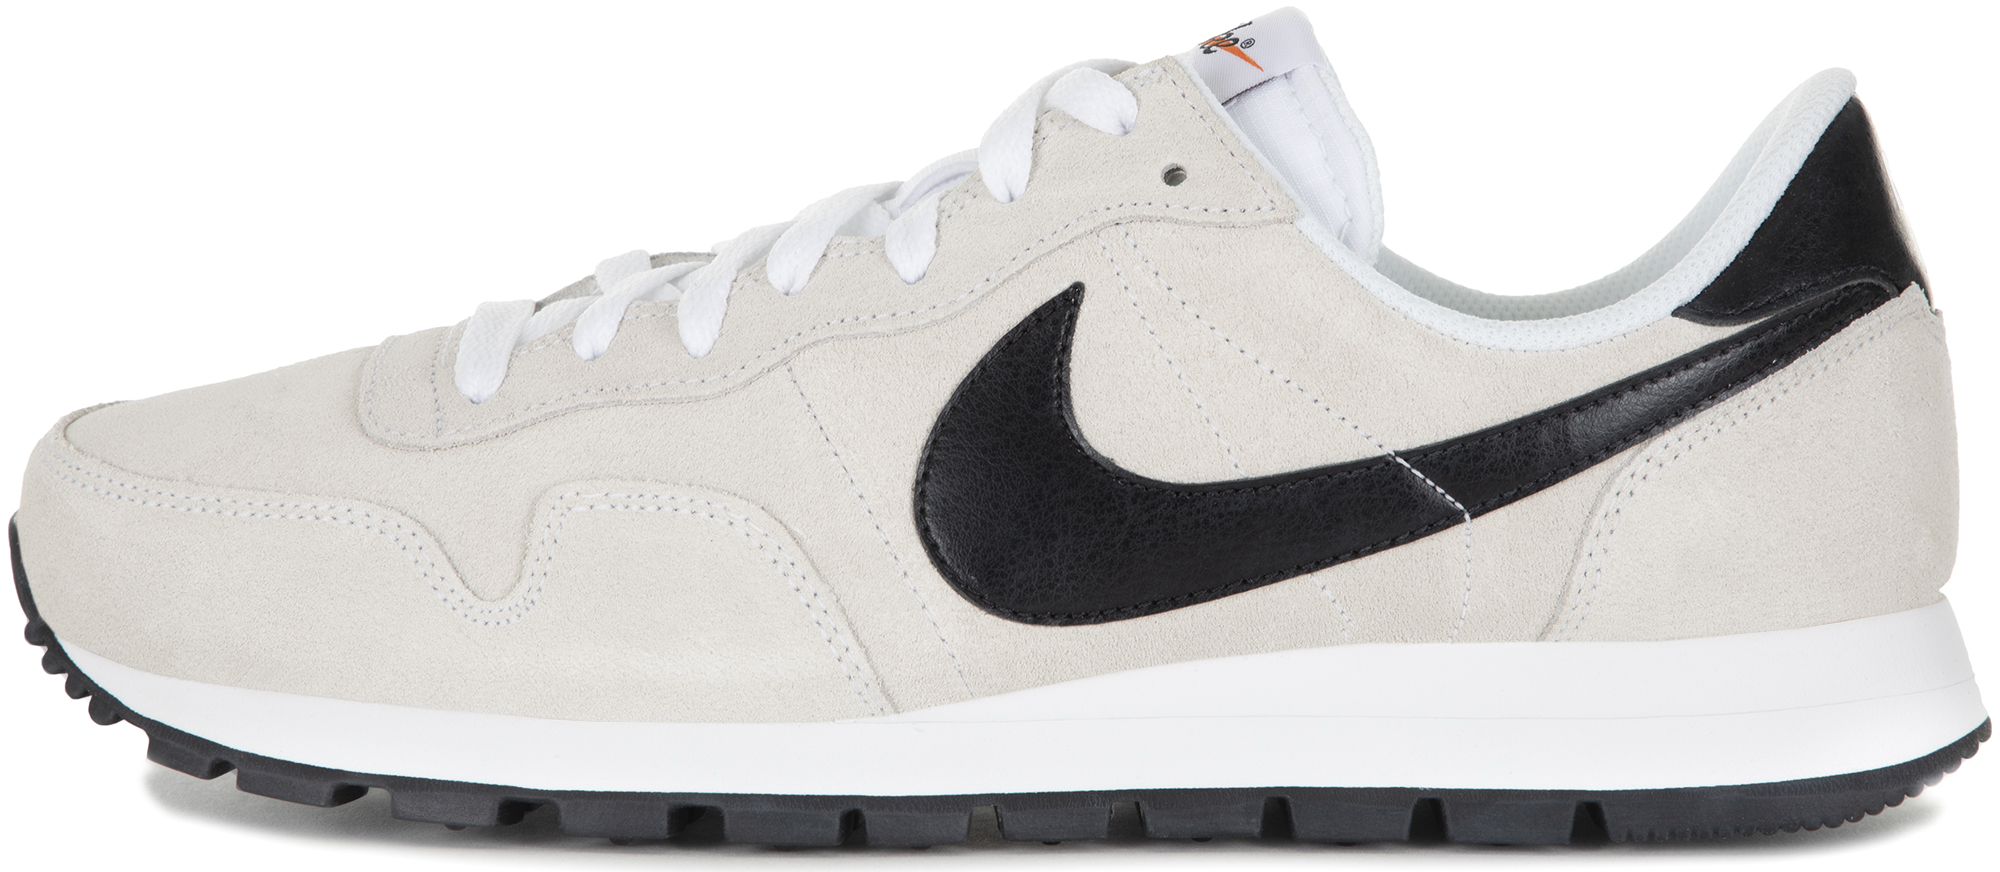 Nike Кроссовки мужские Nike Air Pegasus '83 Leather, размер 40 недорго, оригинальная цена